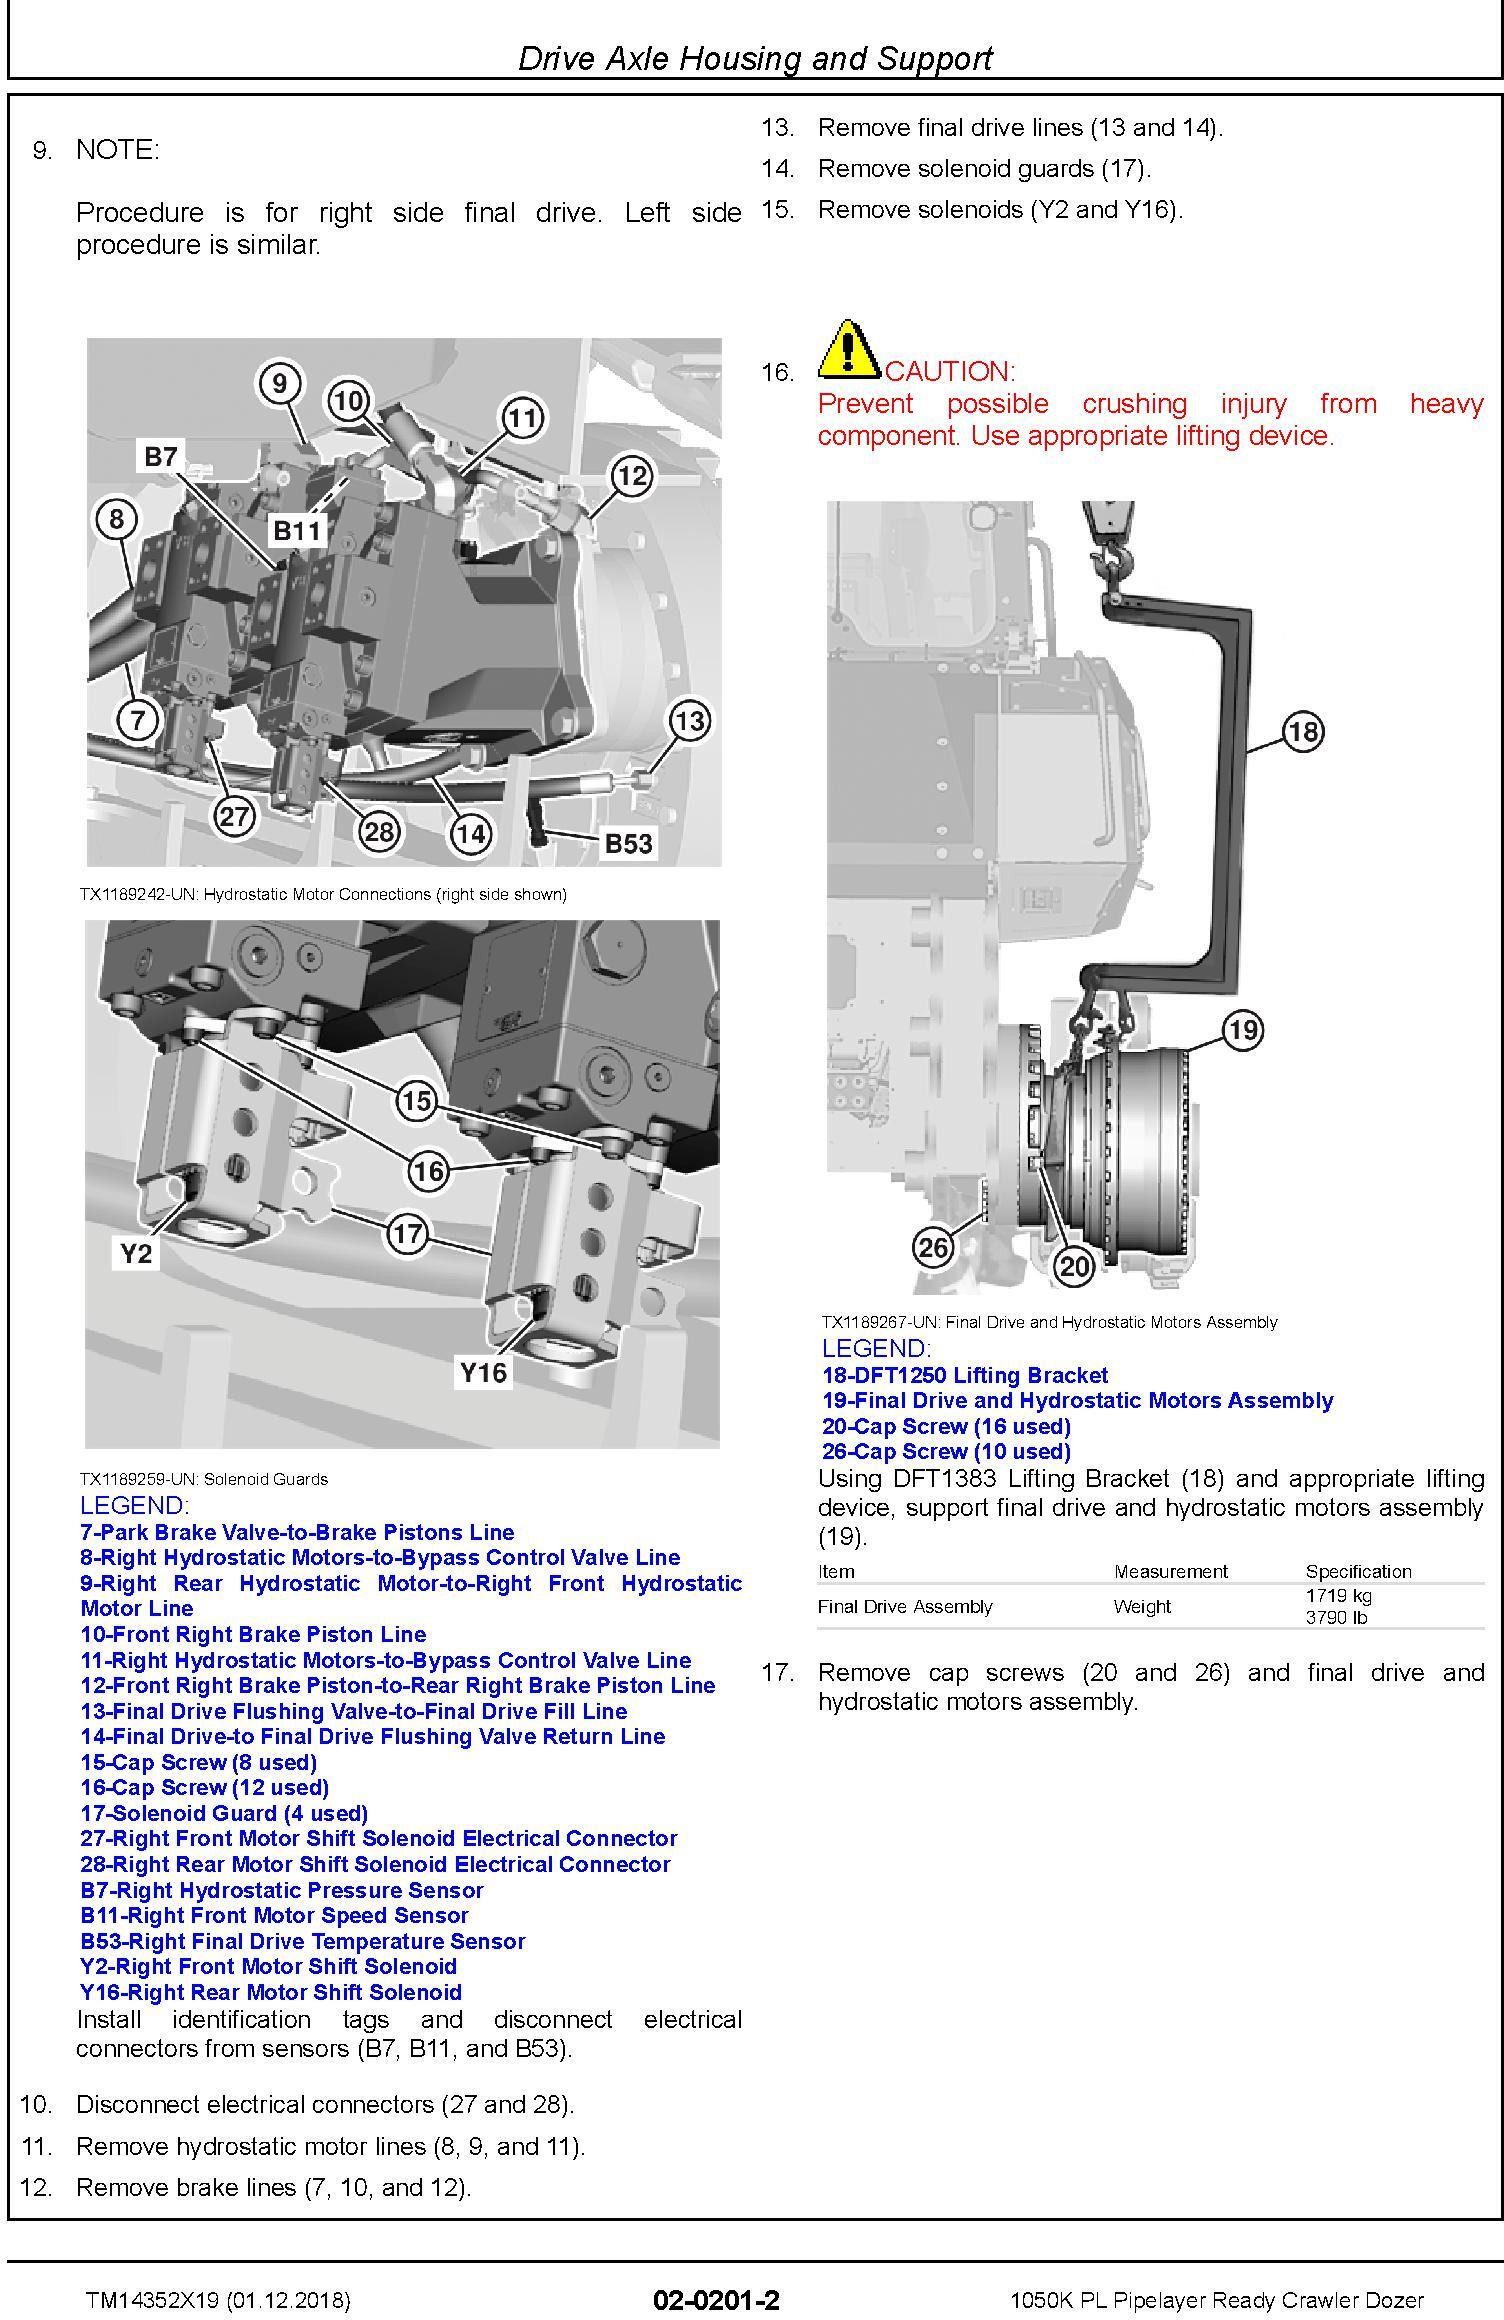 John Deere 1050K PL (SN.F318802-) Pipelayer Ready Crawler Dozer Repair Technical Manual (TM14352X19) - 3